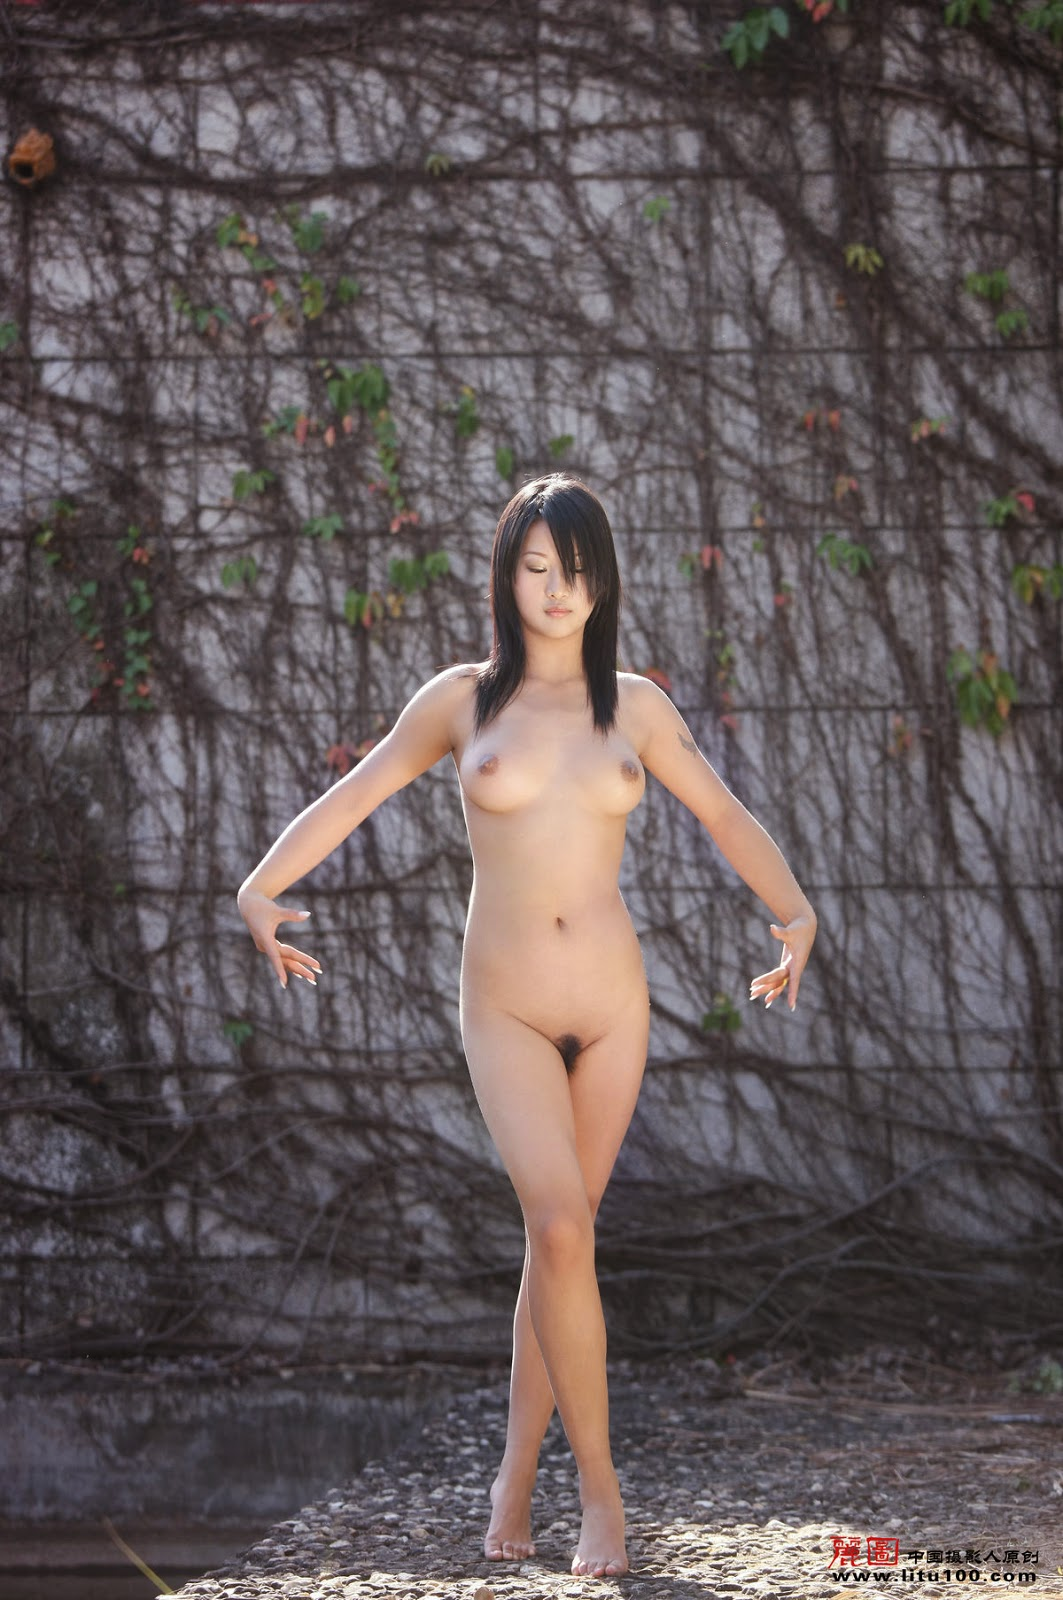 Nude Art Photos